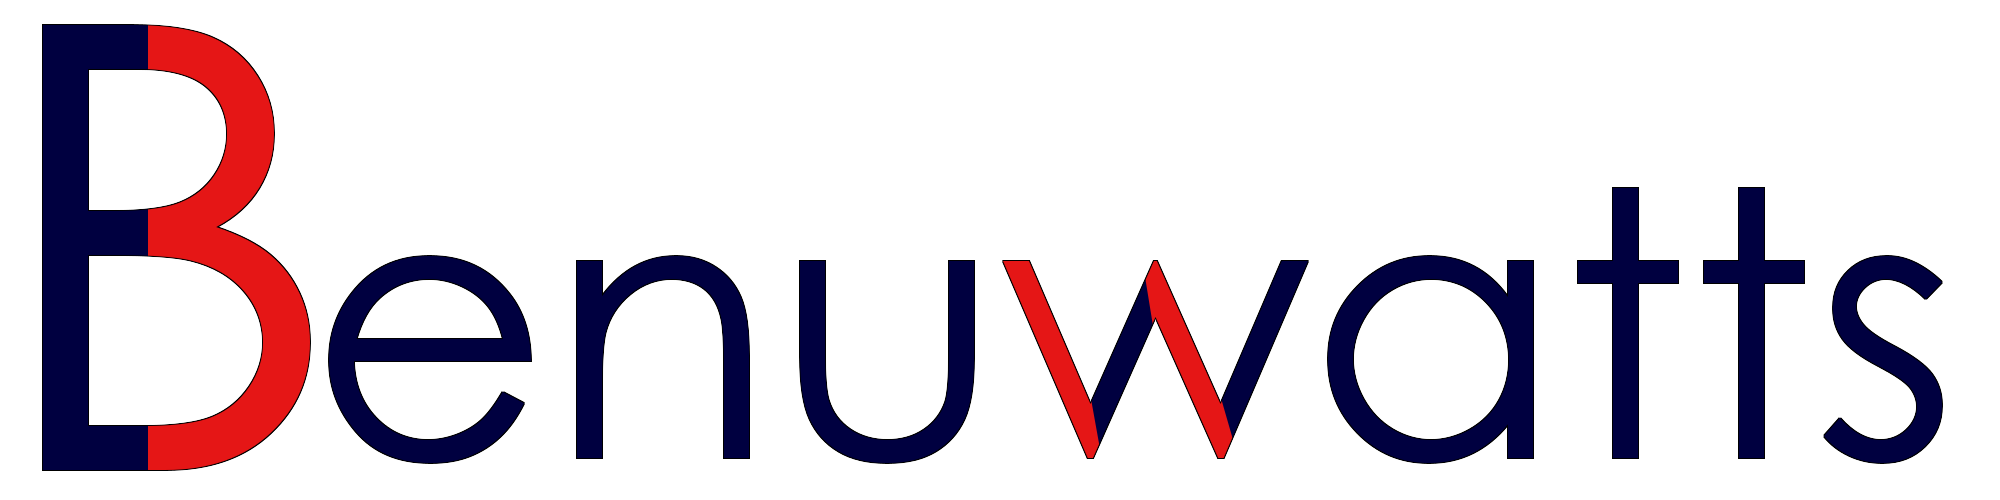 Benuwatts Company Limited